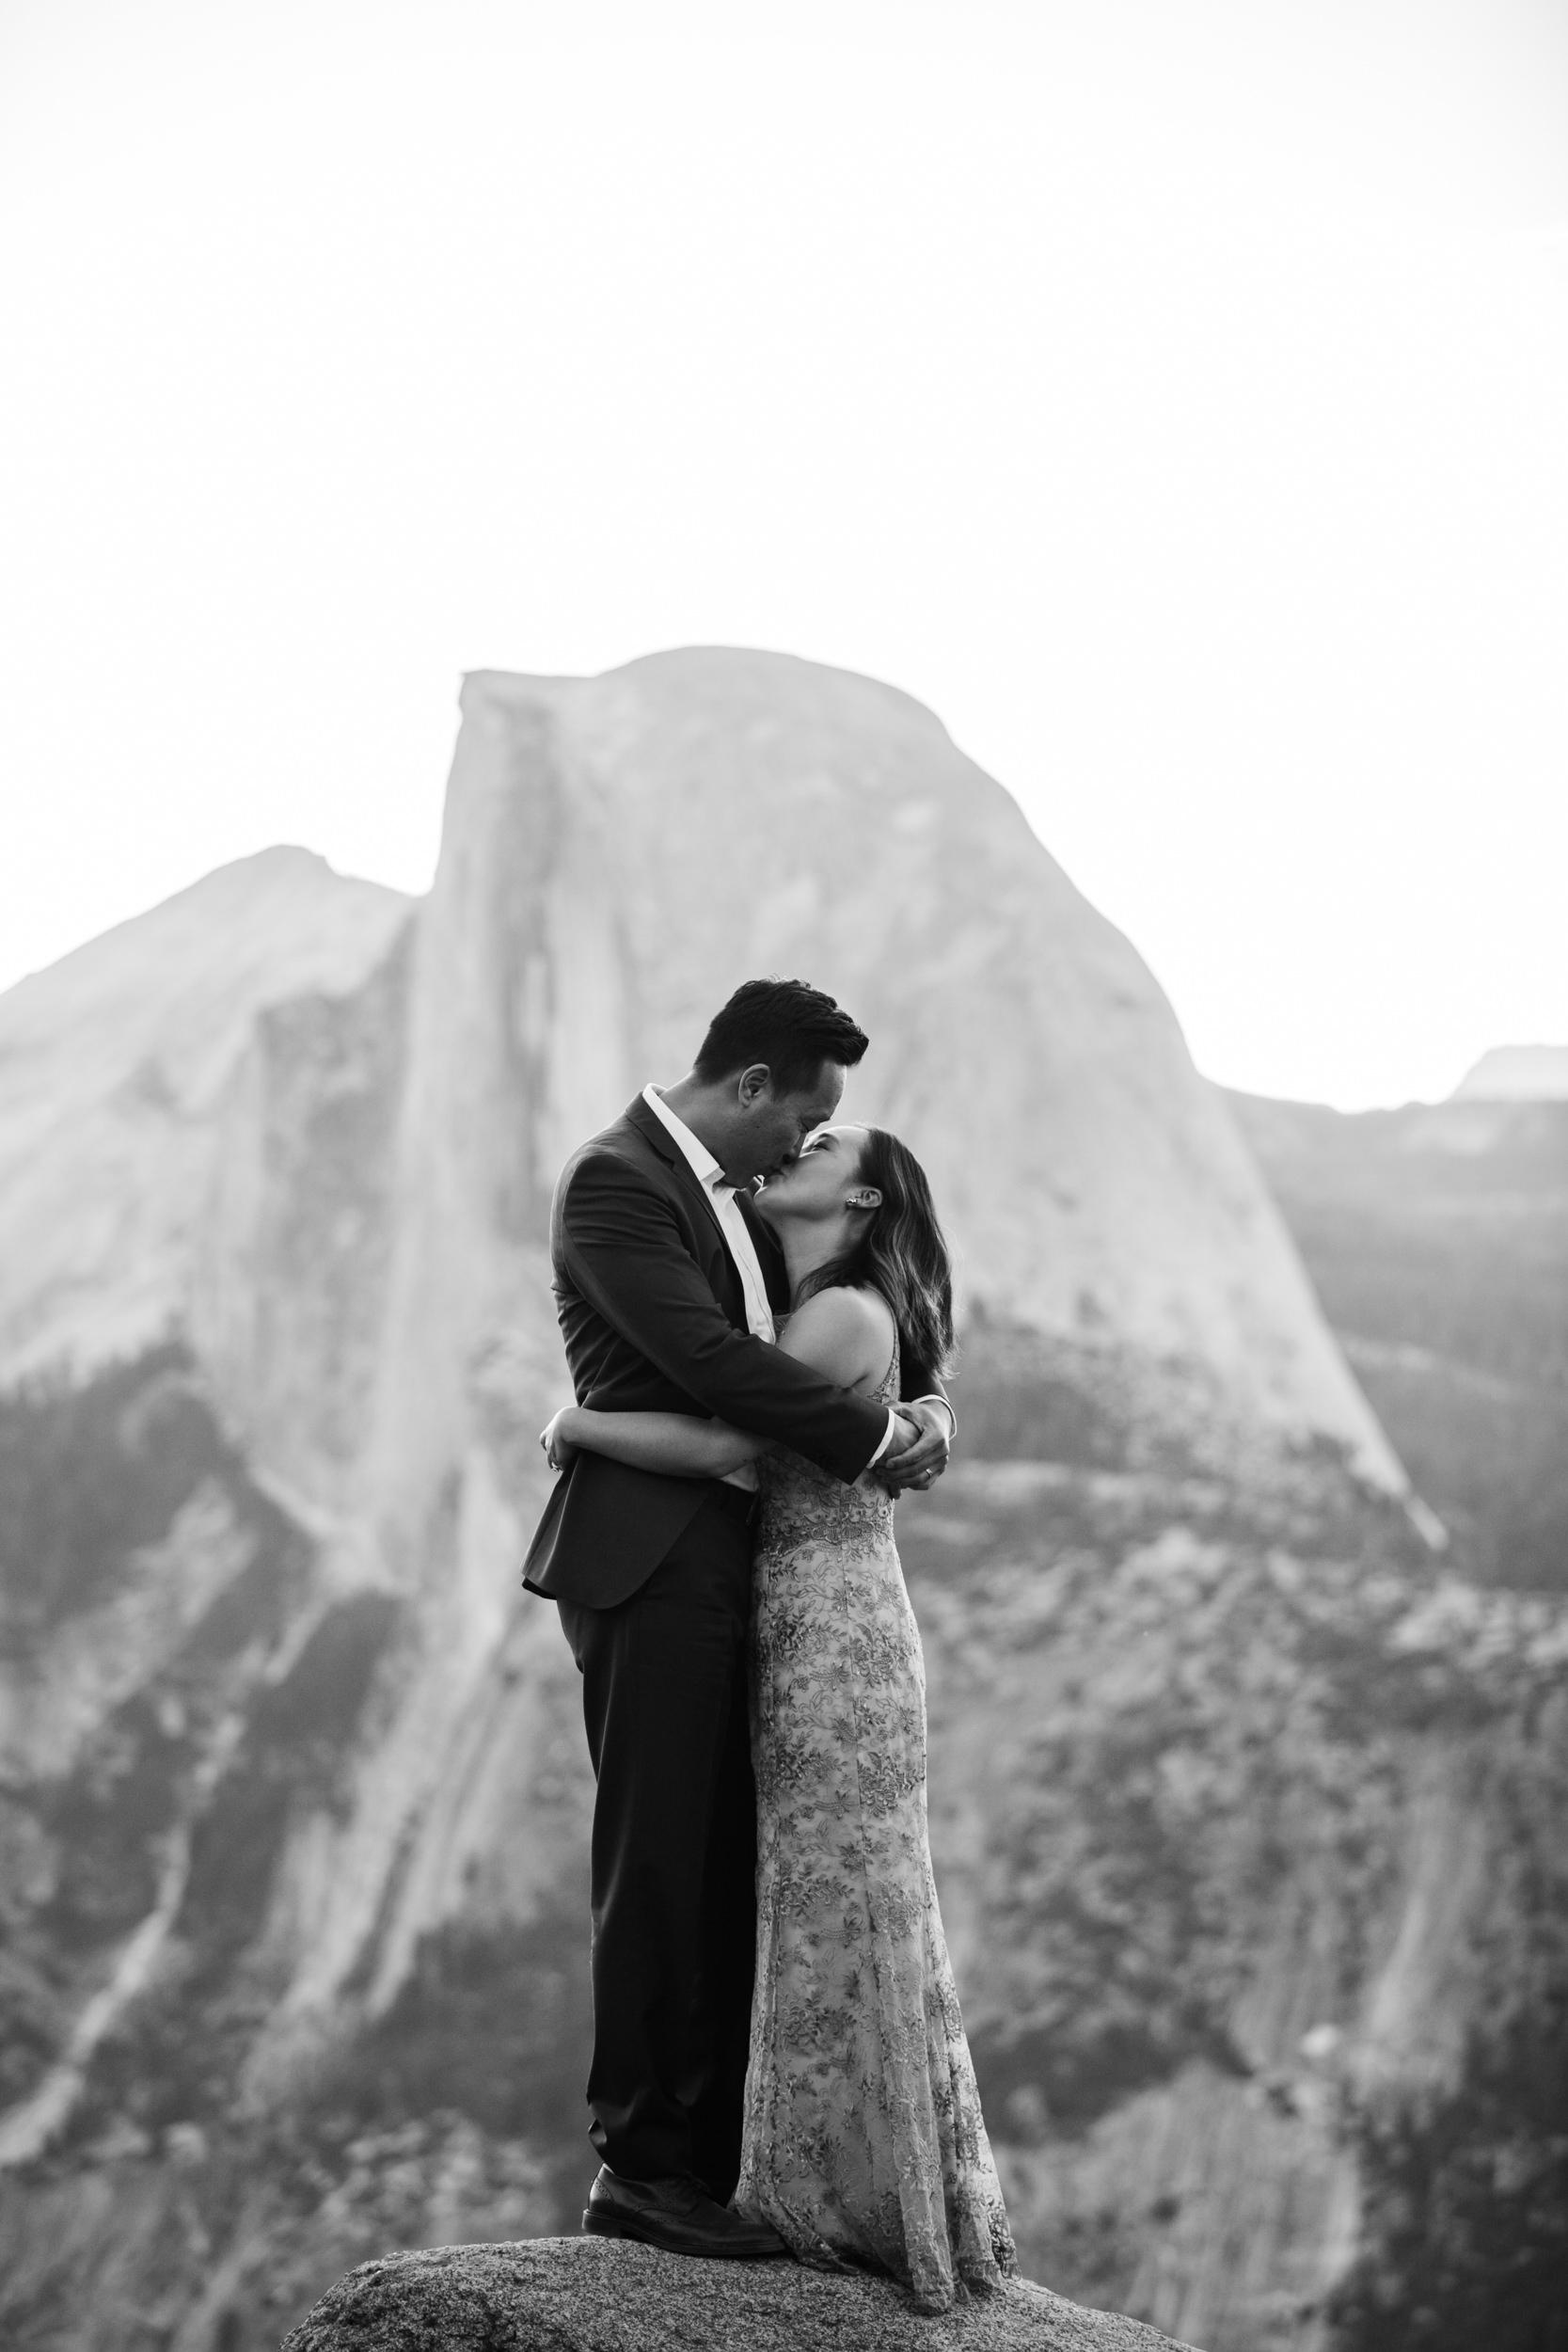 michelle + doug's adventure session at glacier point | 10 year wedding anniversary celebration | yosemite elopement inspiration | the hearnes adventure photography